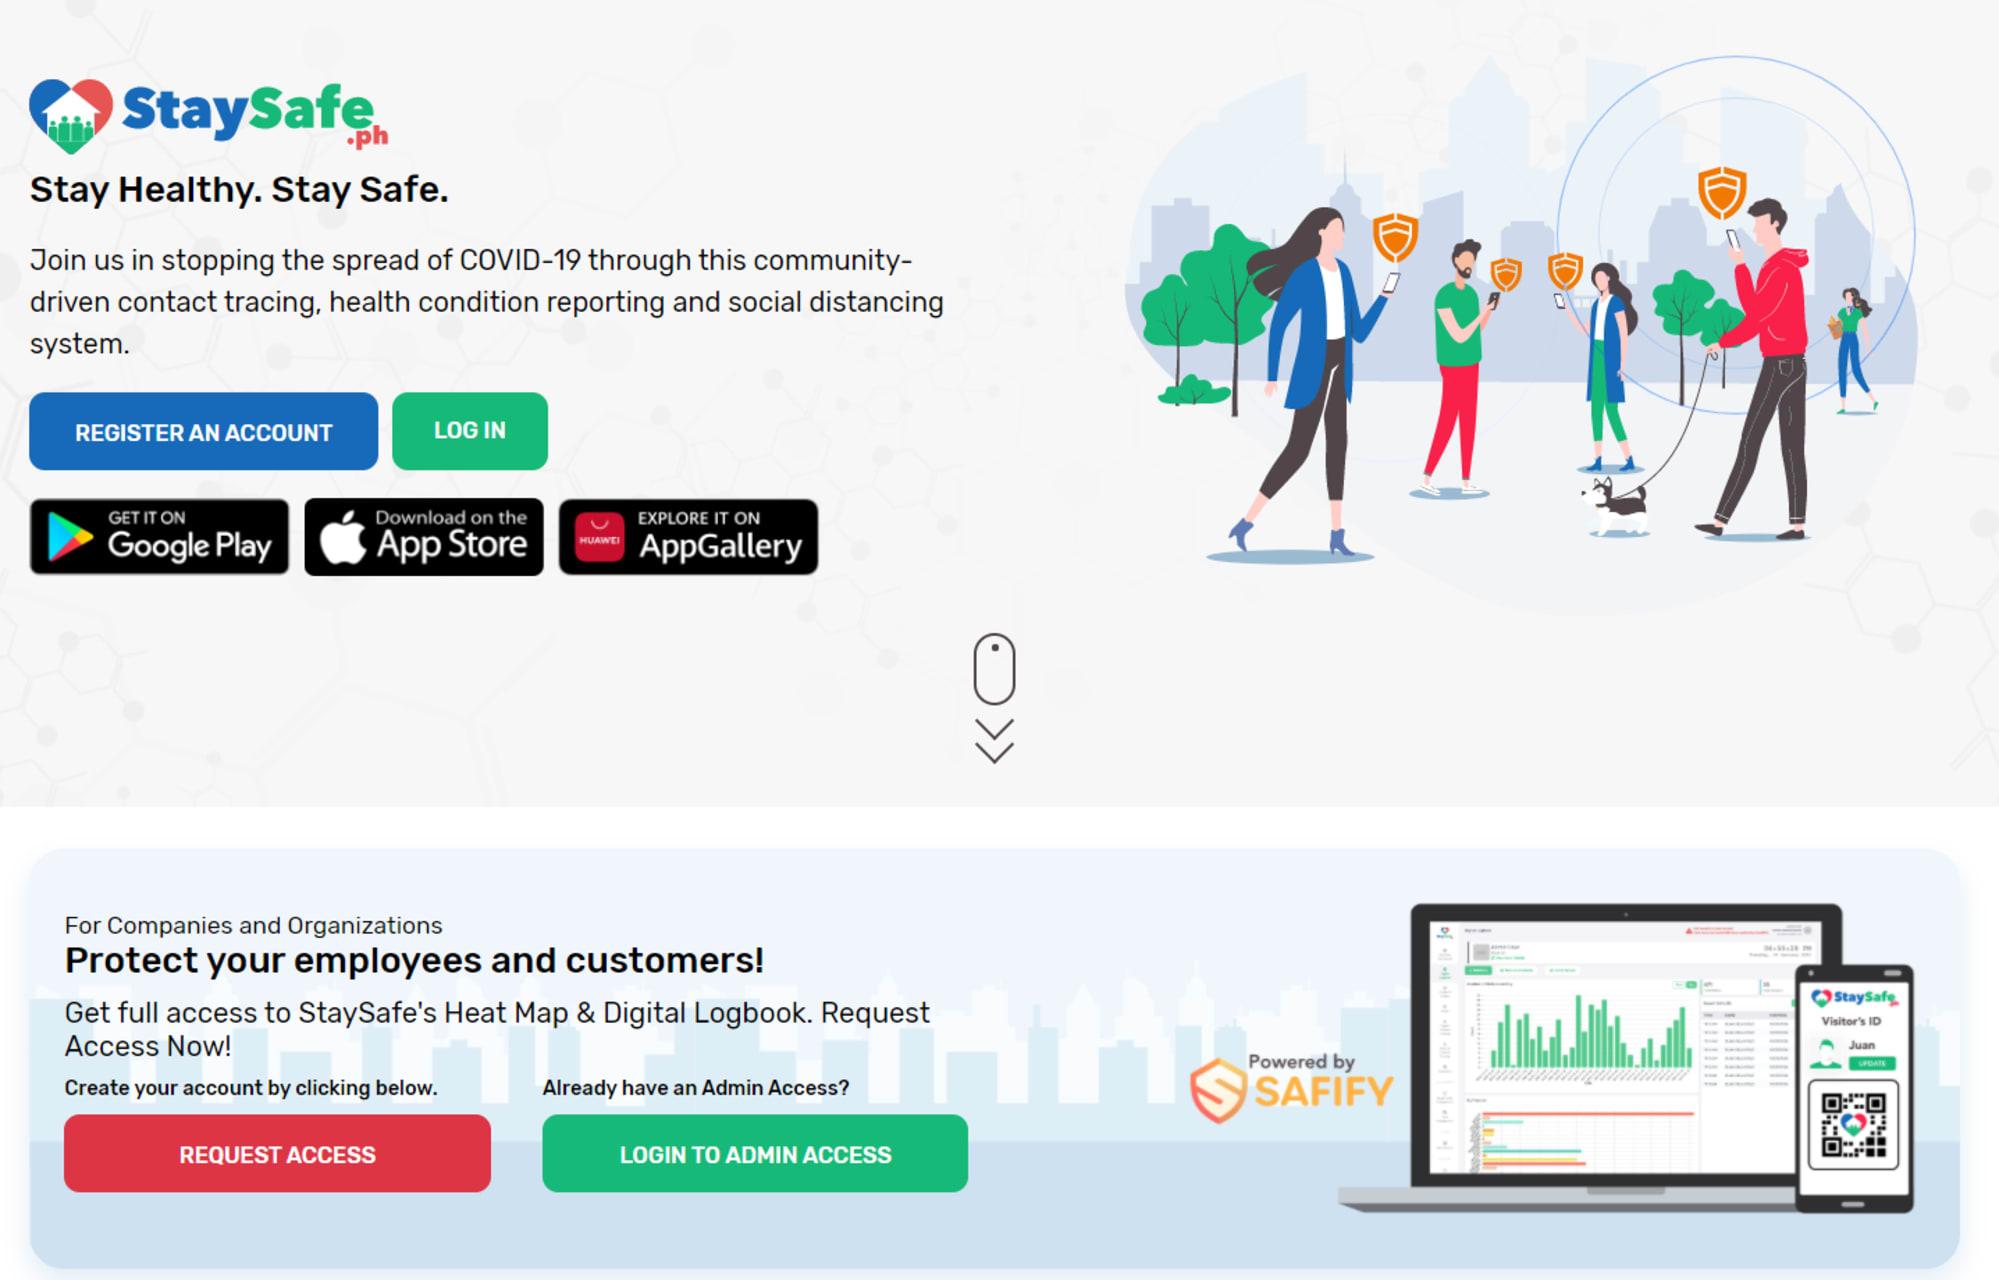 DILG advised the LGUs use the new StaySafe App